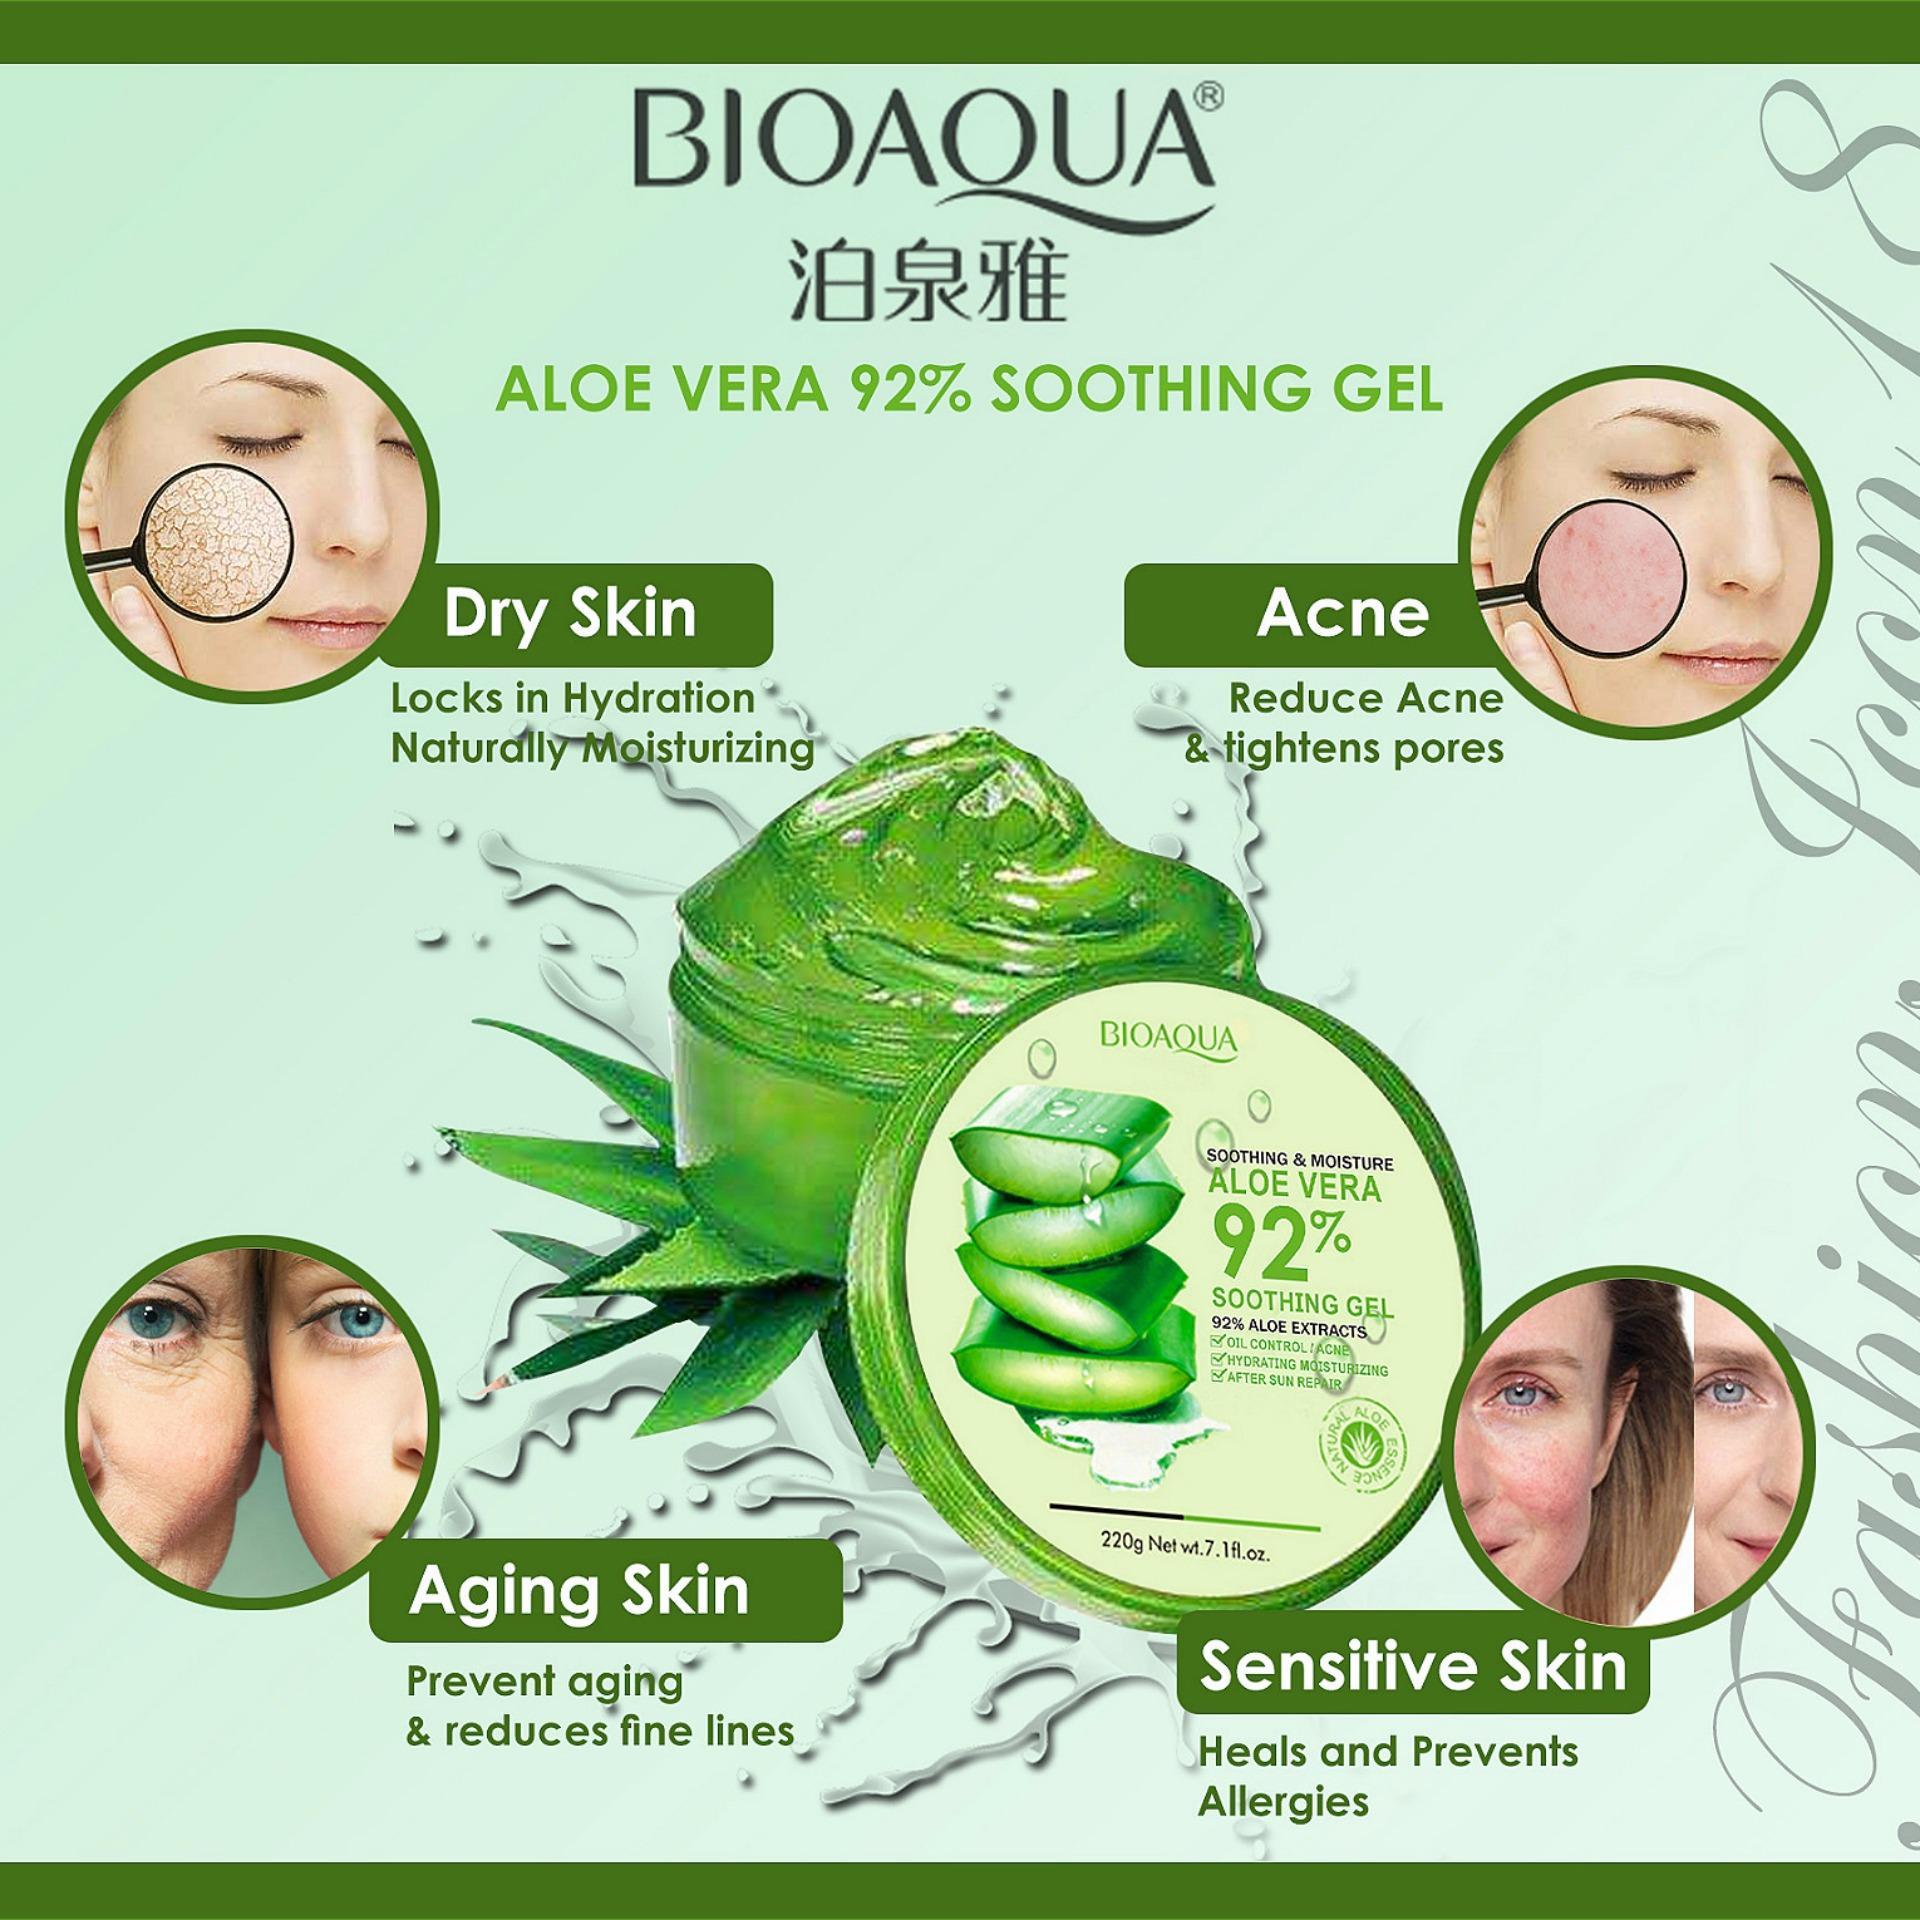 Philippines Bioaqua Soothing Moisturizing Aloe Vera 92 Gel 160ml